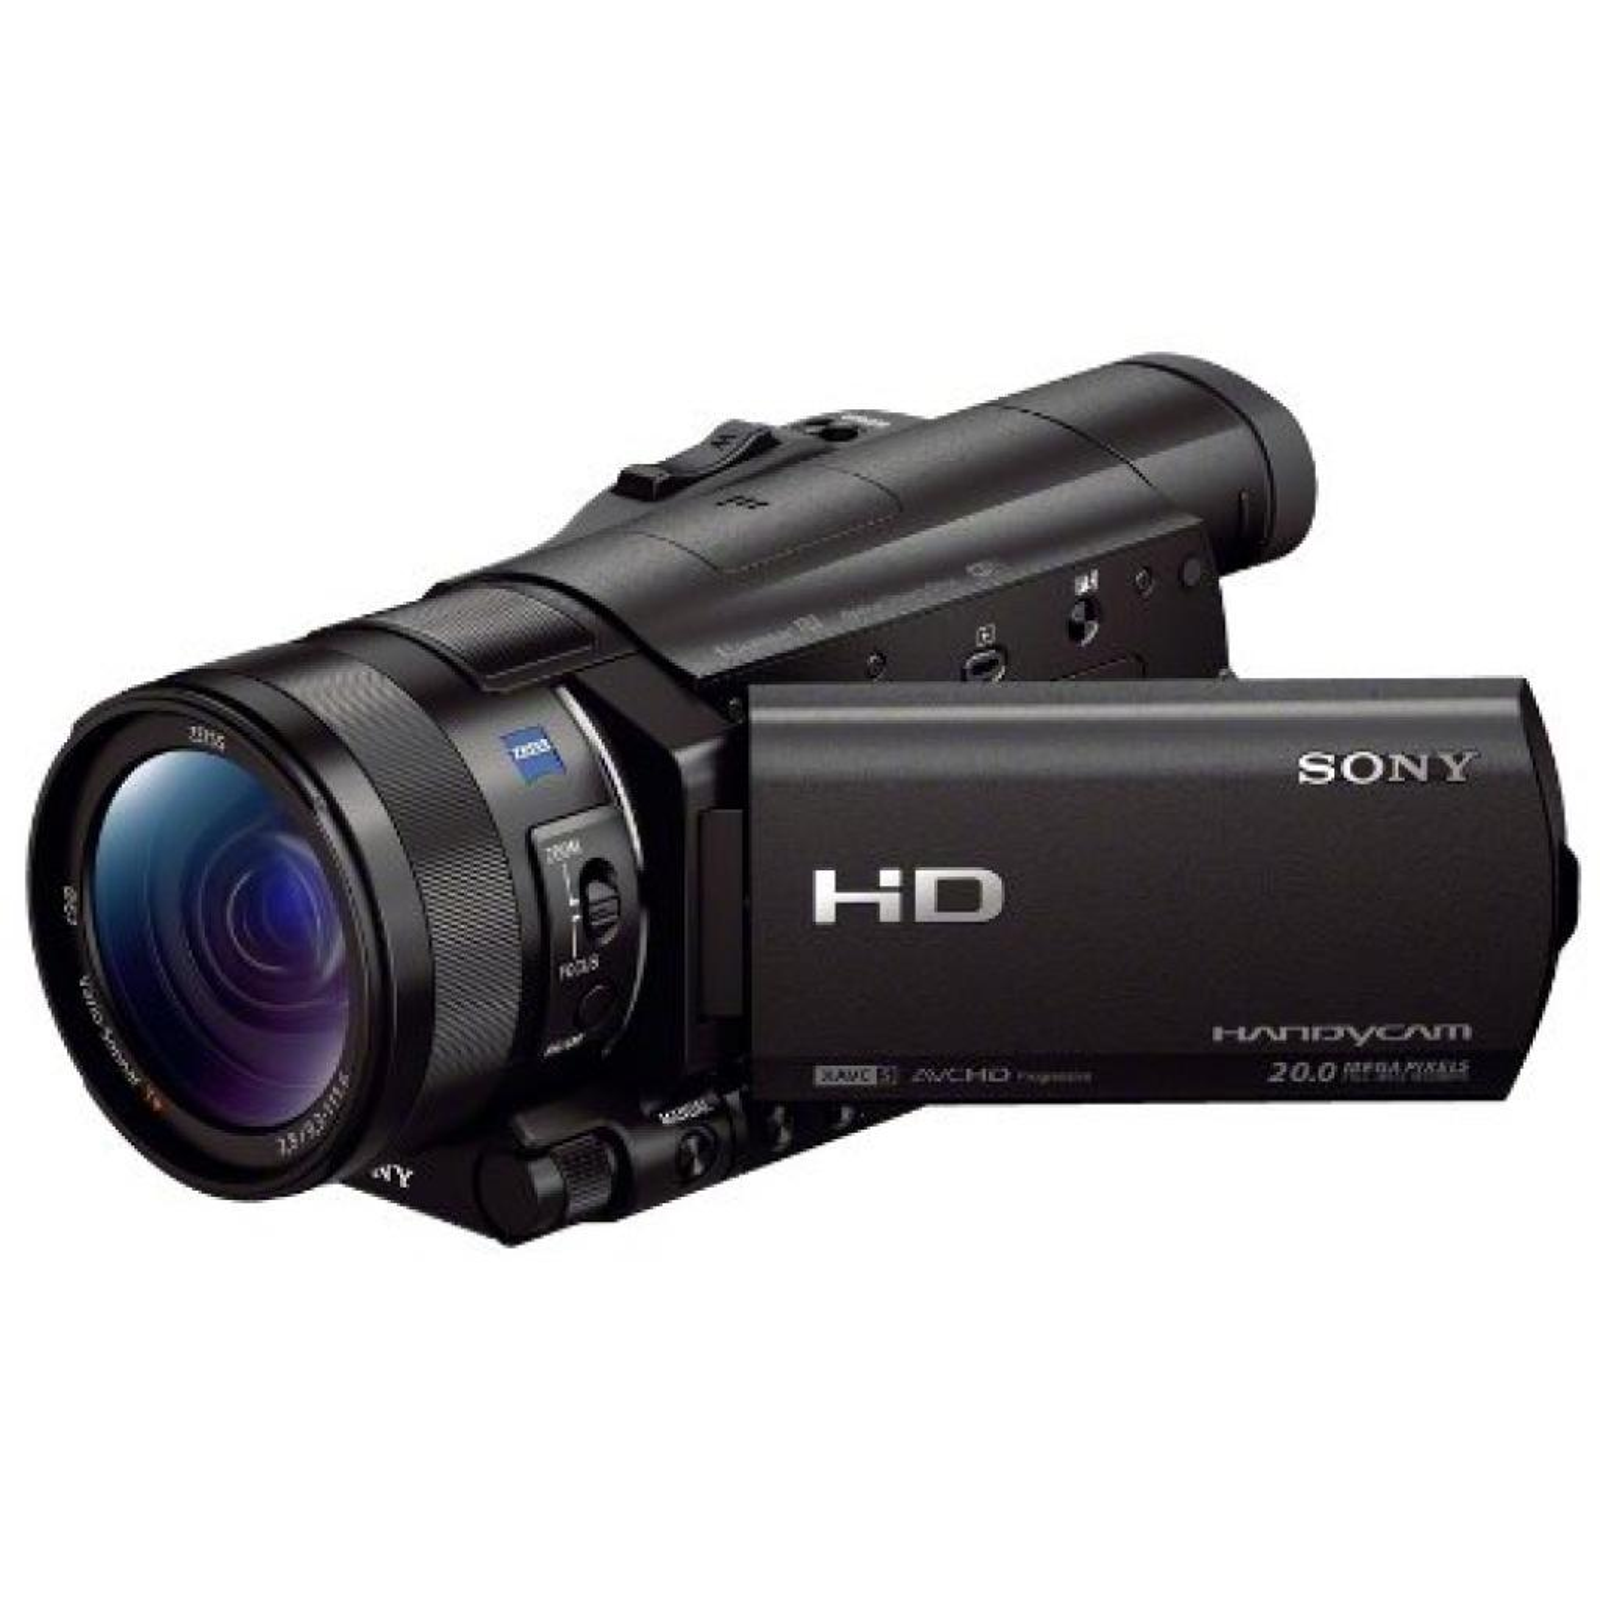 Цифровая видеокамера SONY Handycam HDR-CX900 Black (HDRCX900EB.CEN) изображение 2